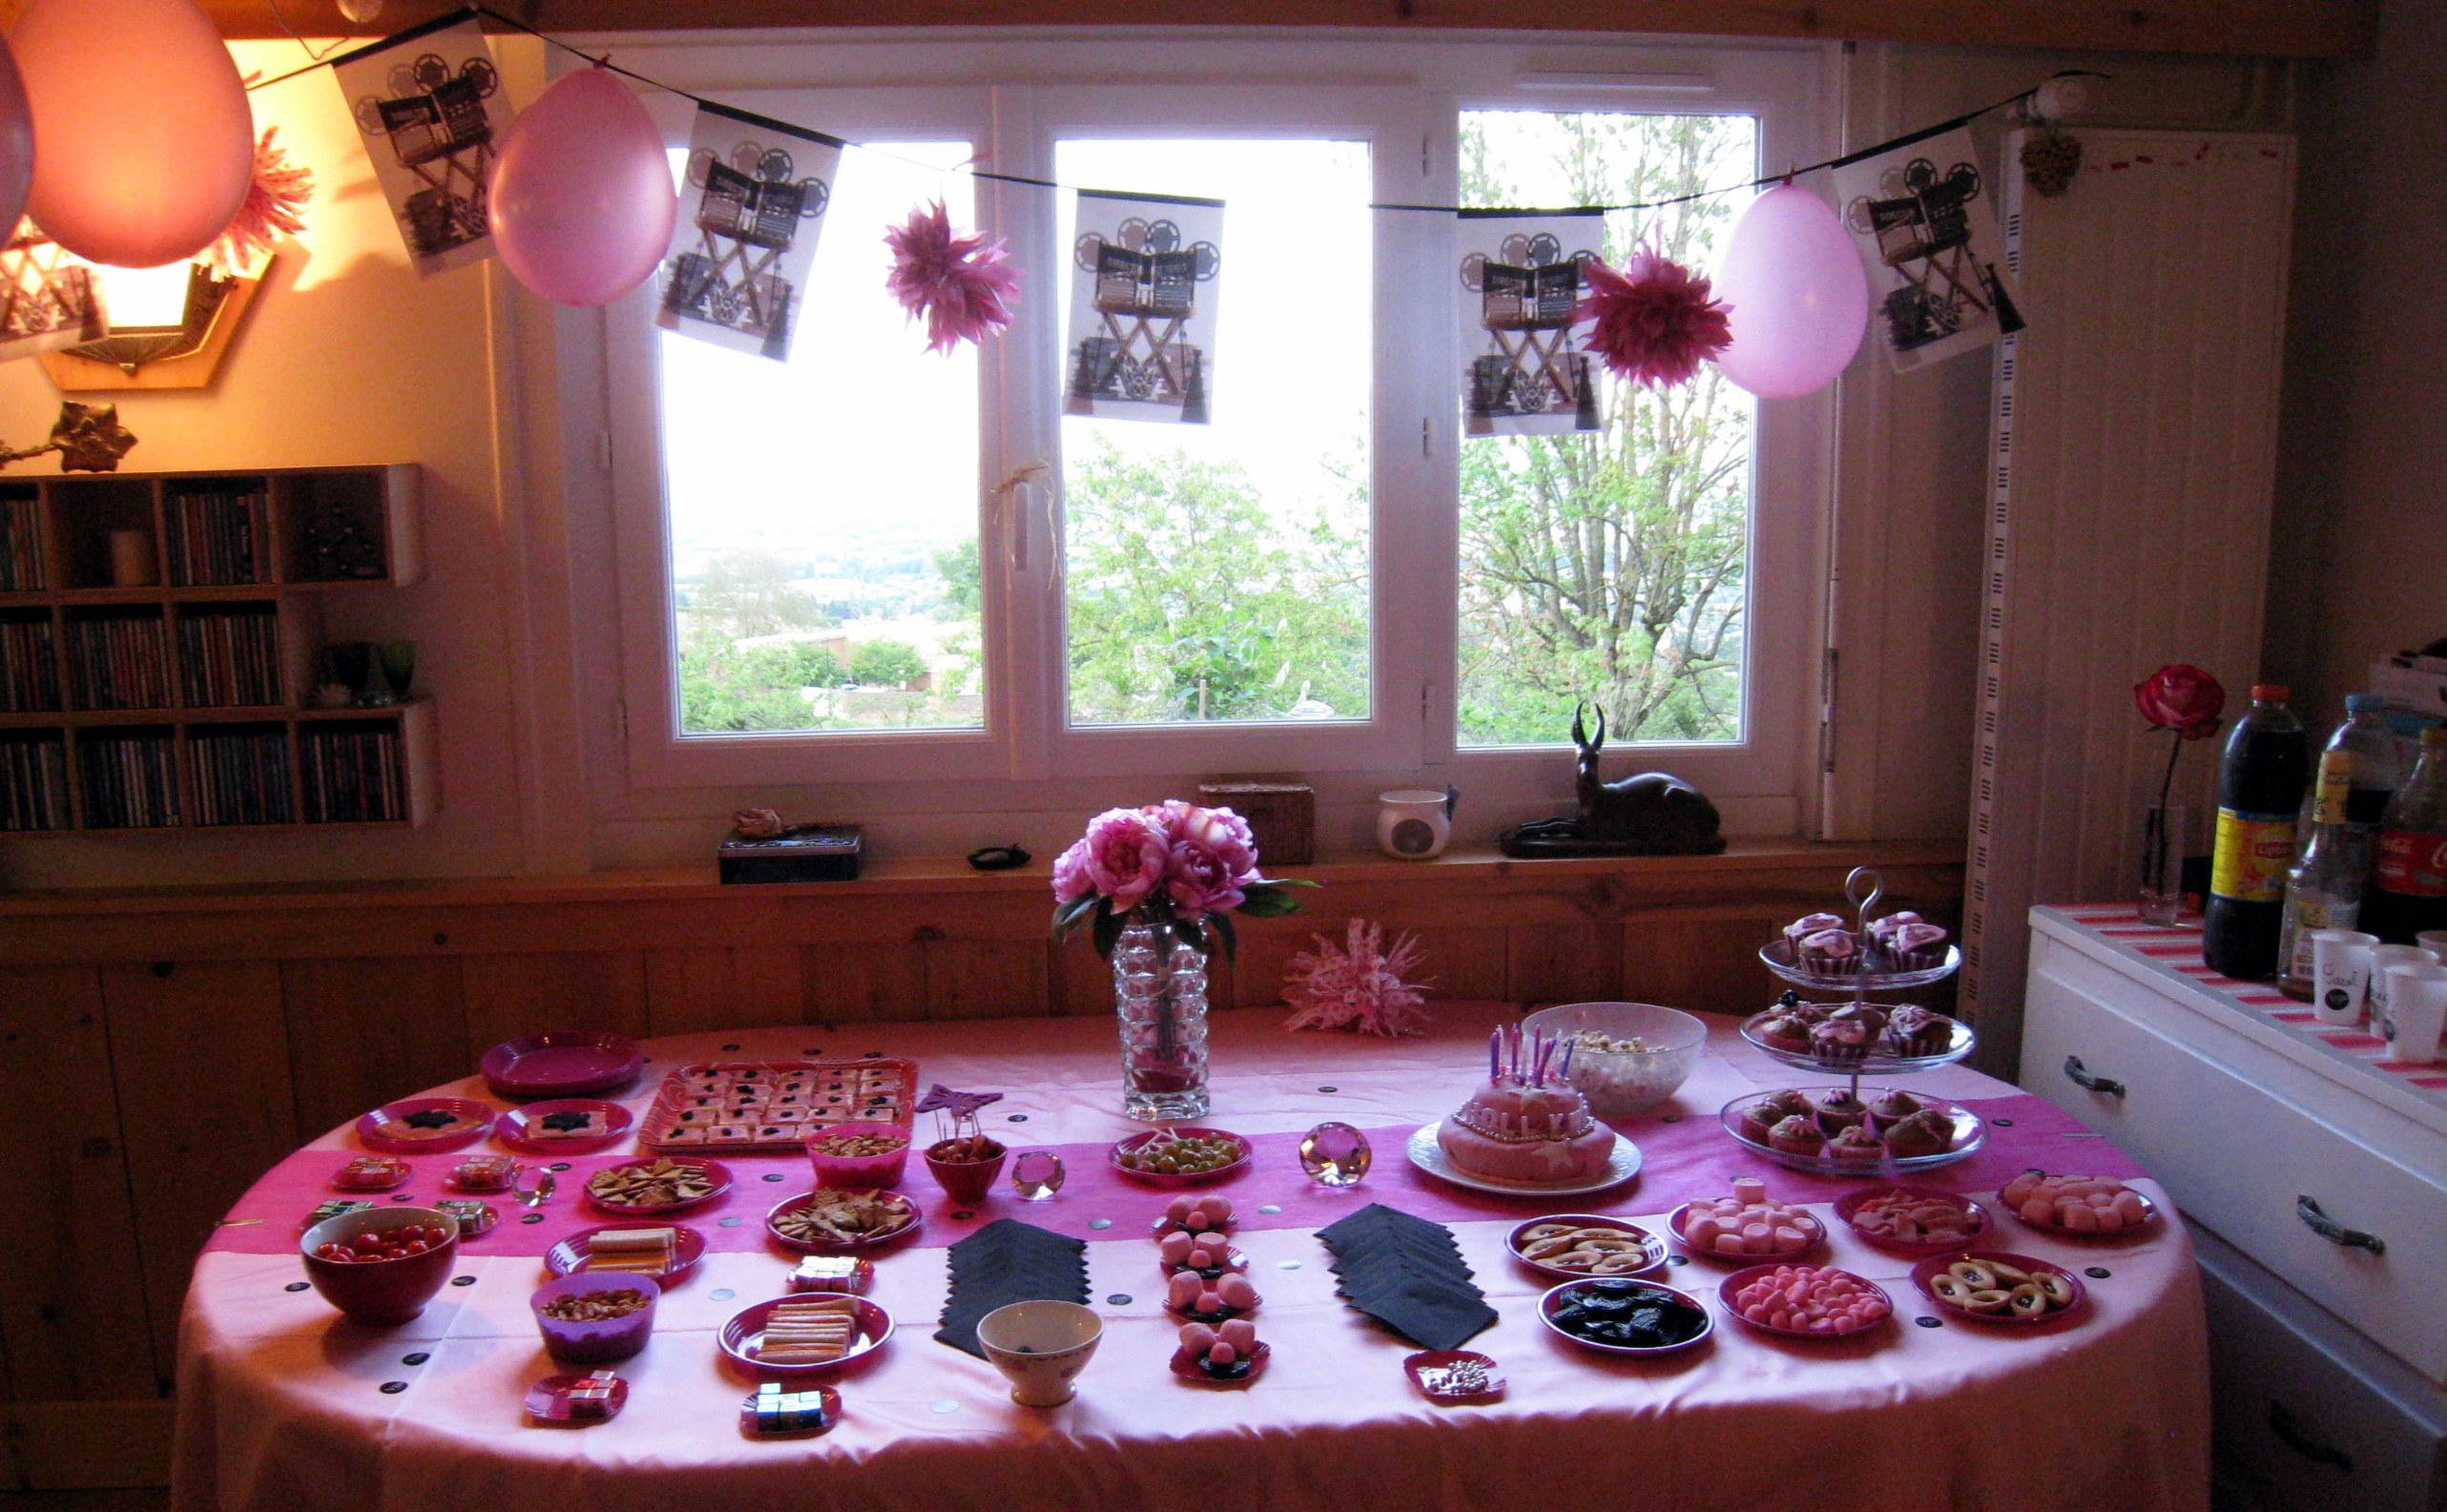 Sweet table rose et noire marie maguelone - Chemin de table rose pale ...